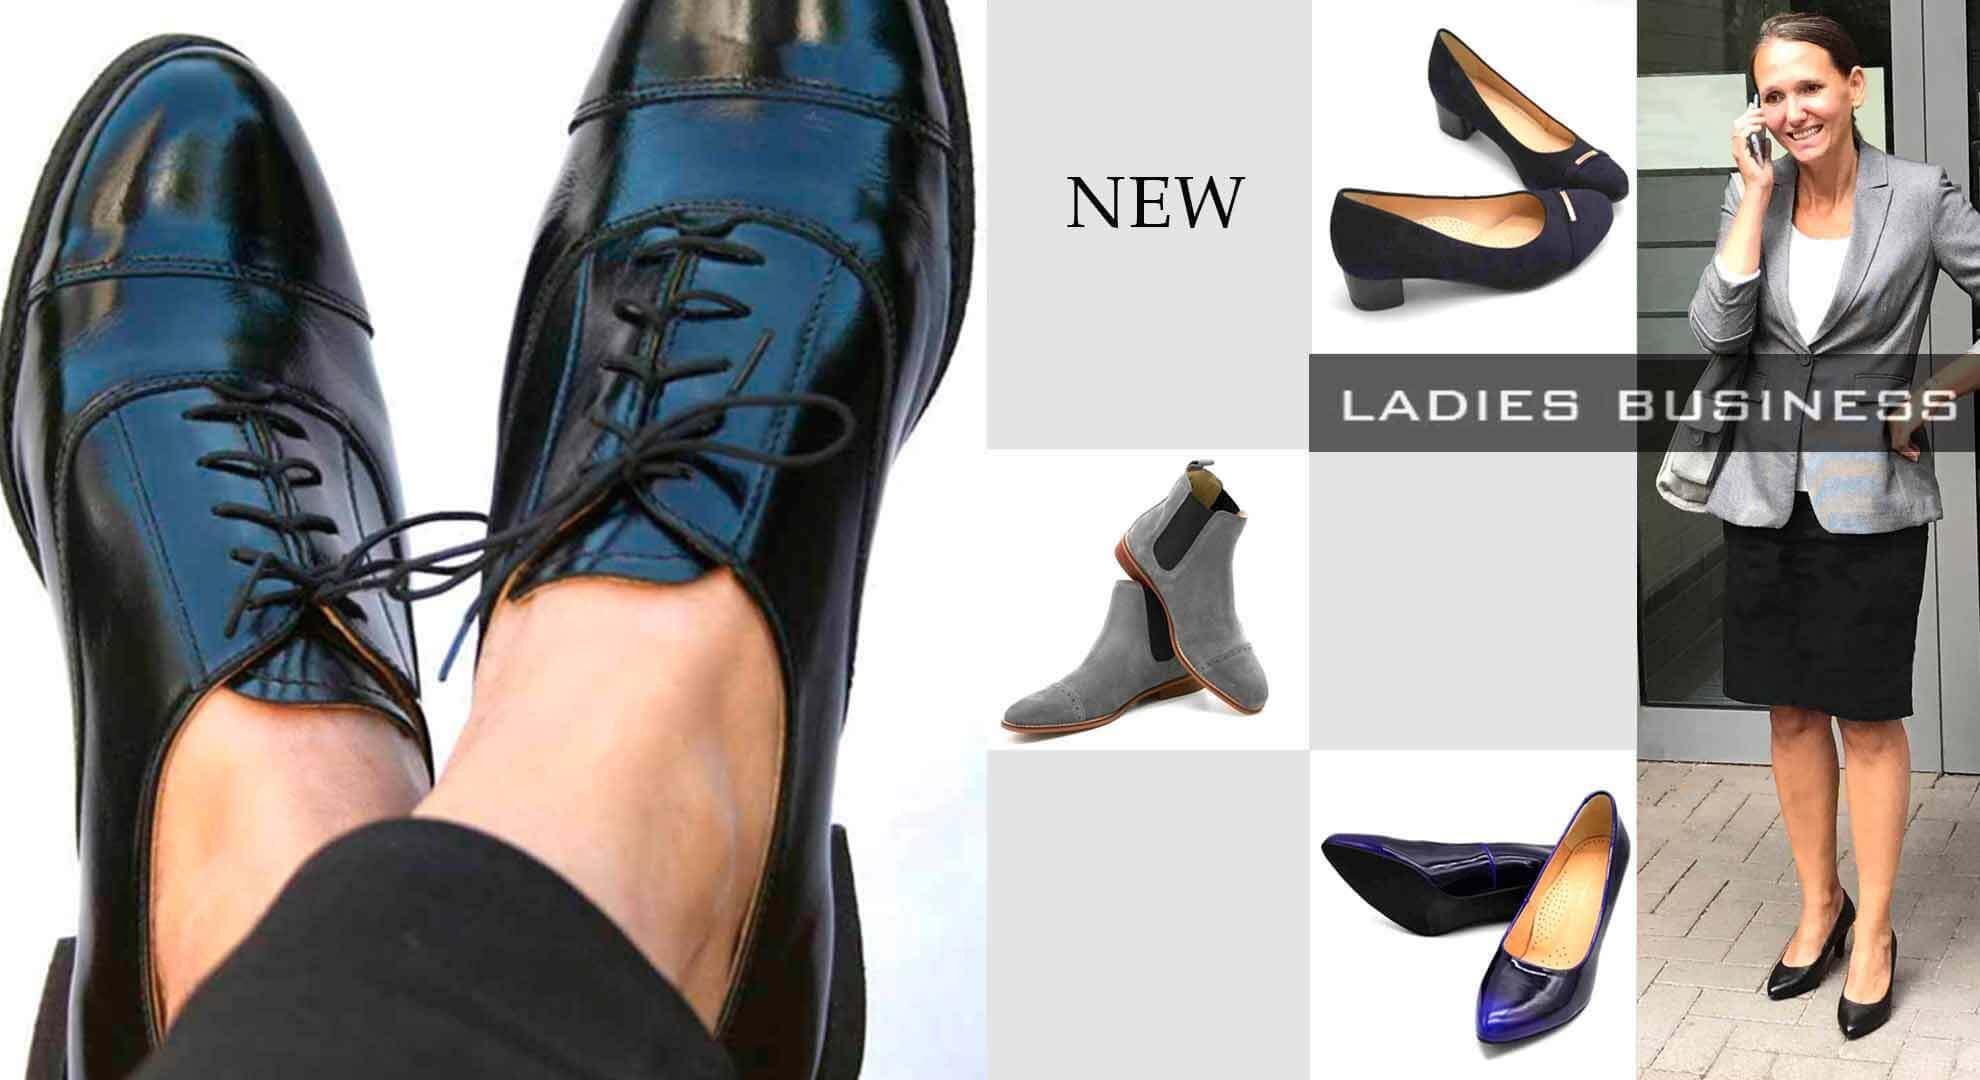 low priced da7e2 5dddf Business Herrenschuhe im individuellen Design | Shoes 4 ...